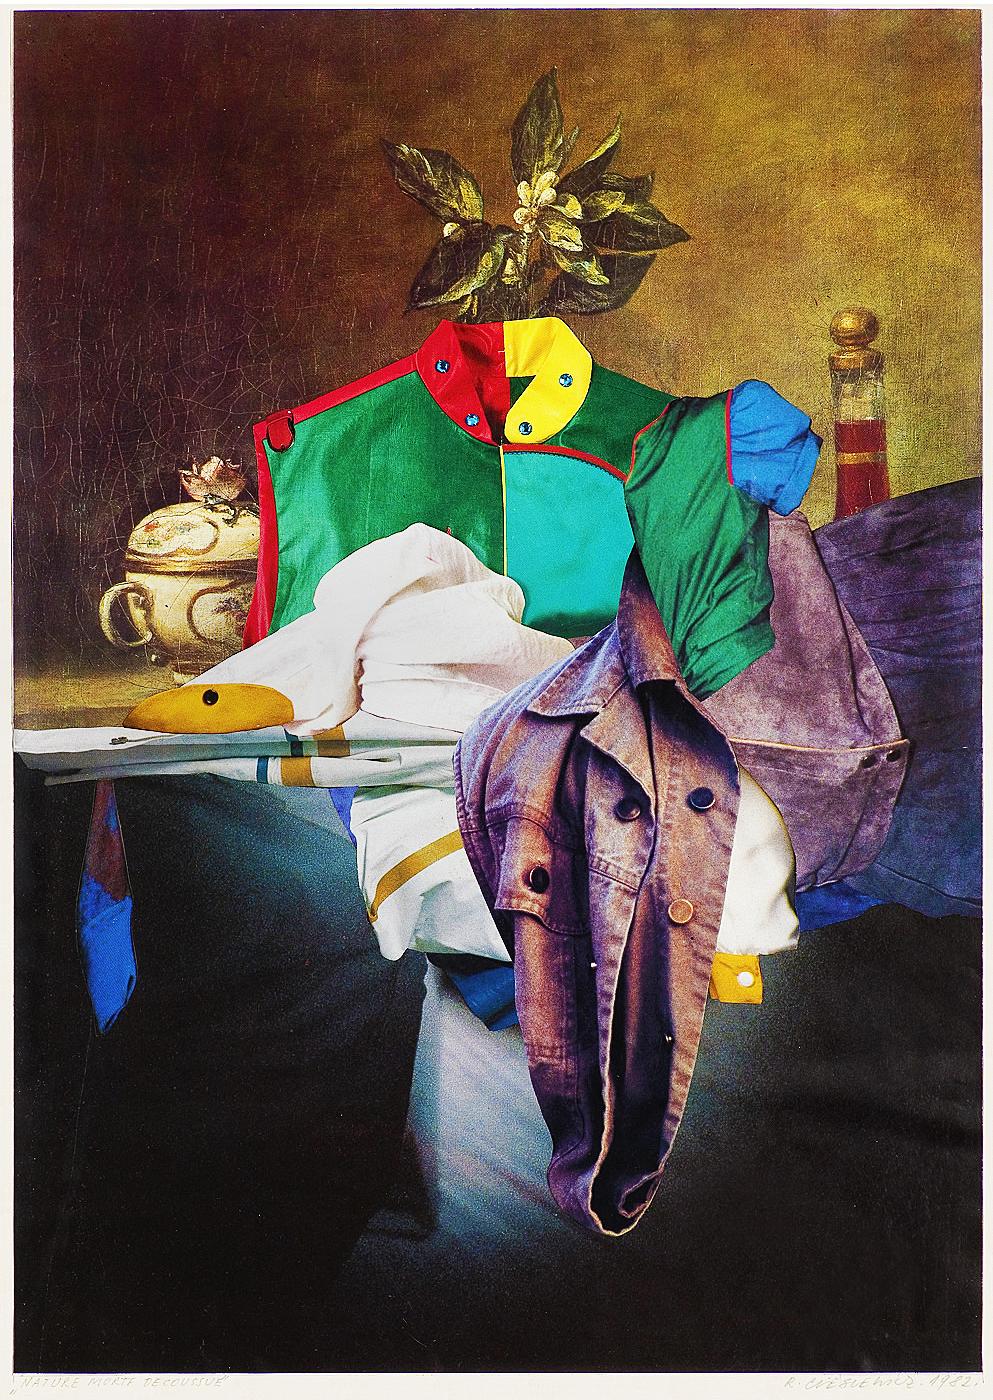 Роман Цеслевич. Образ натюрморта, 1982; колаж